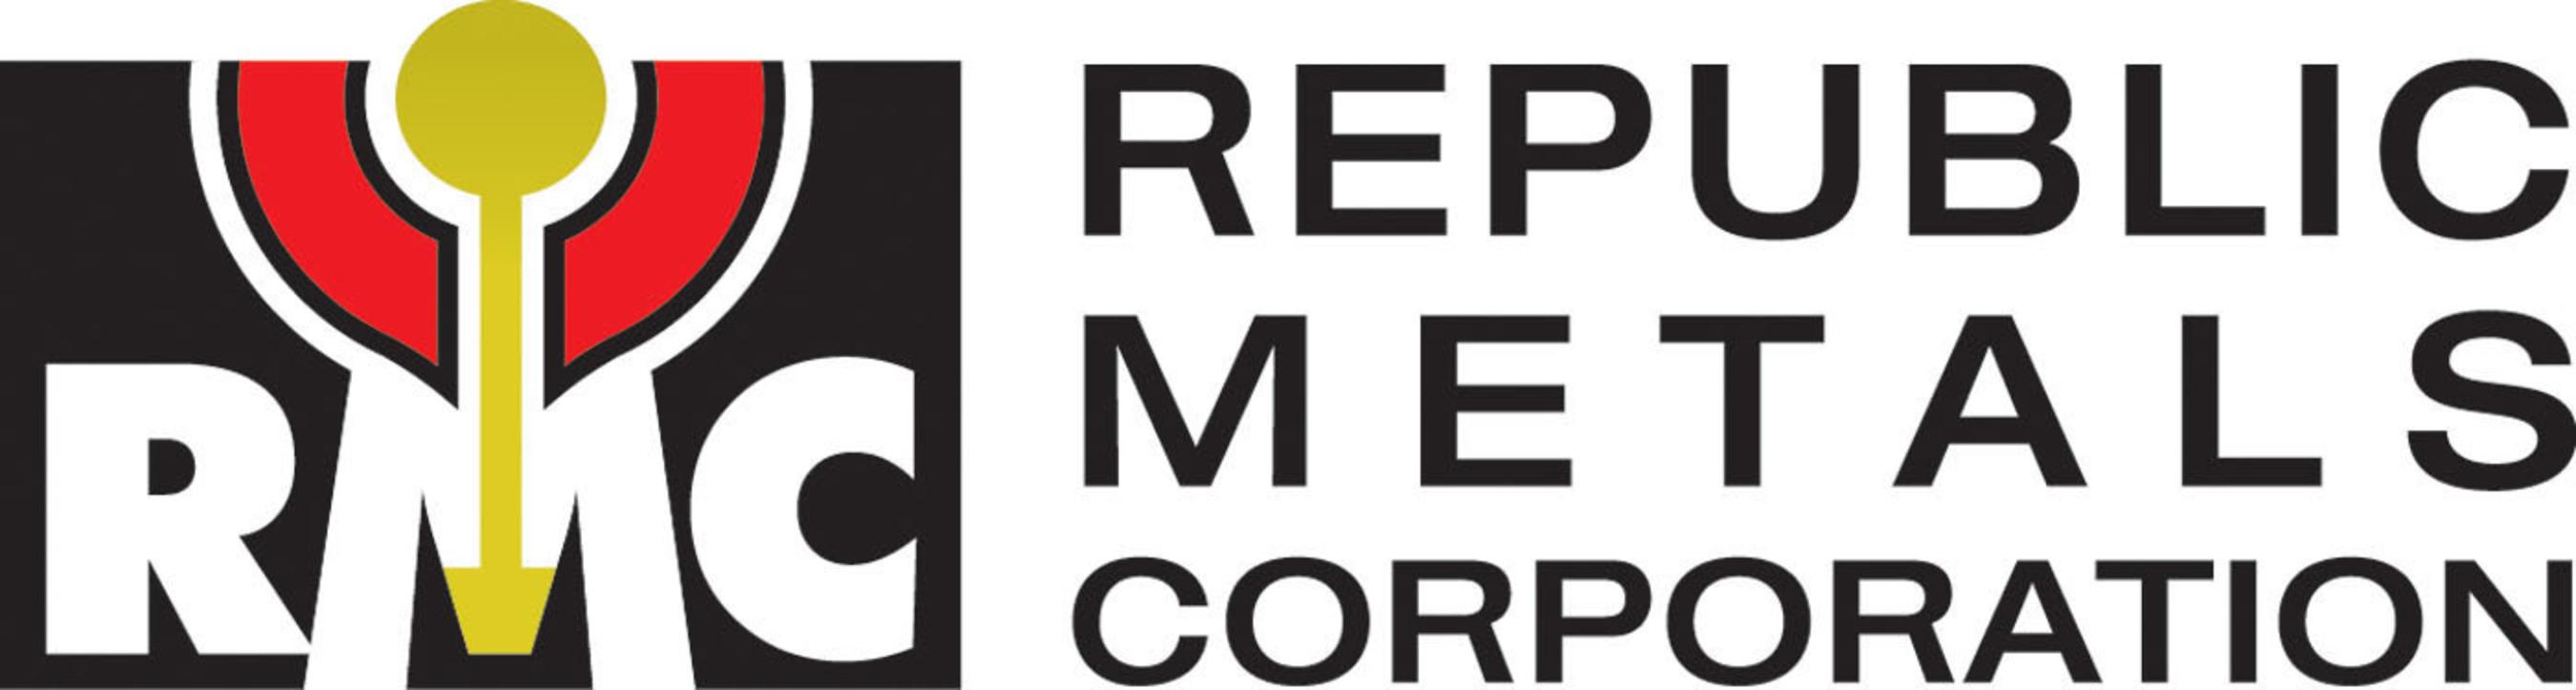 Republic Metals Corporation Logo.